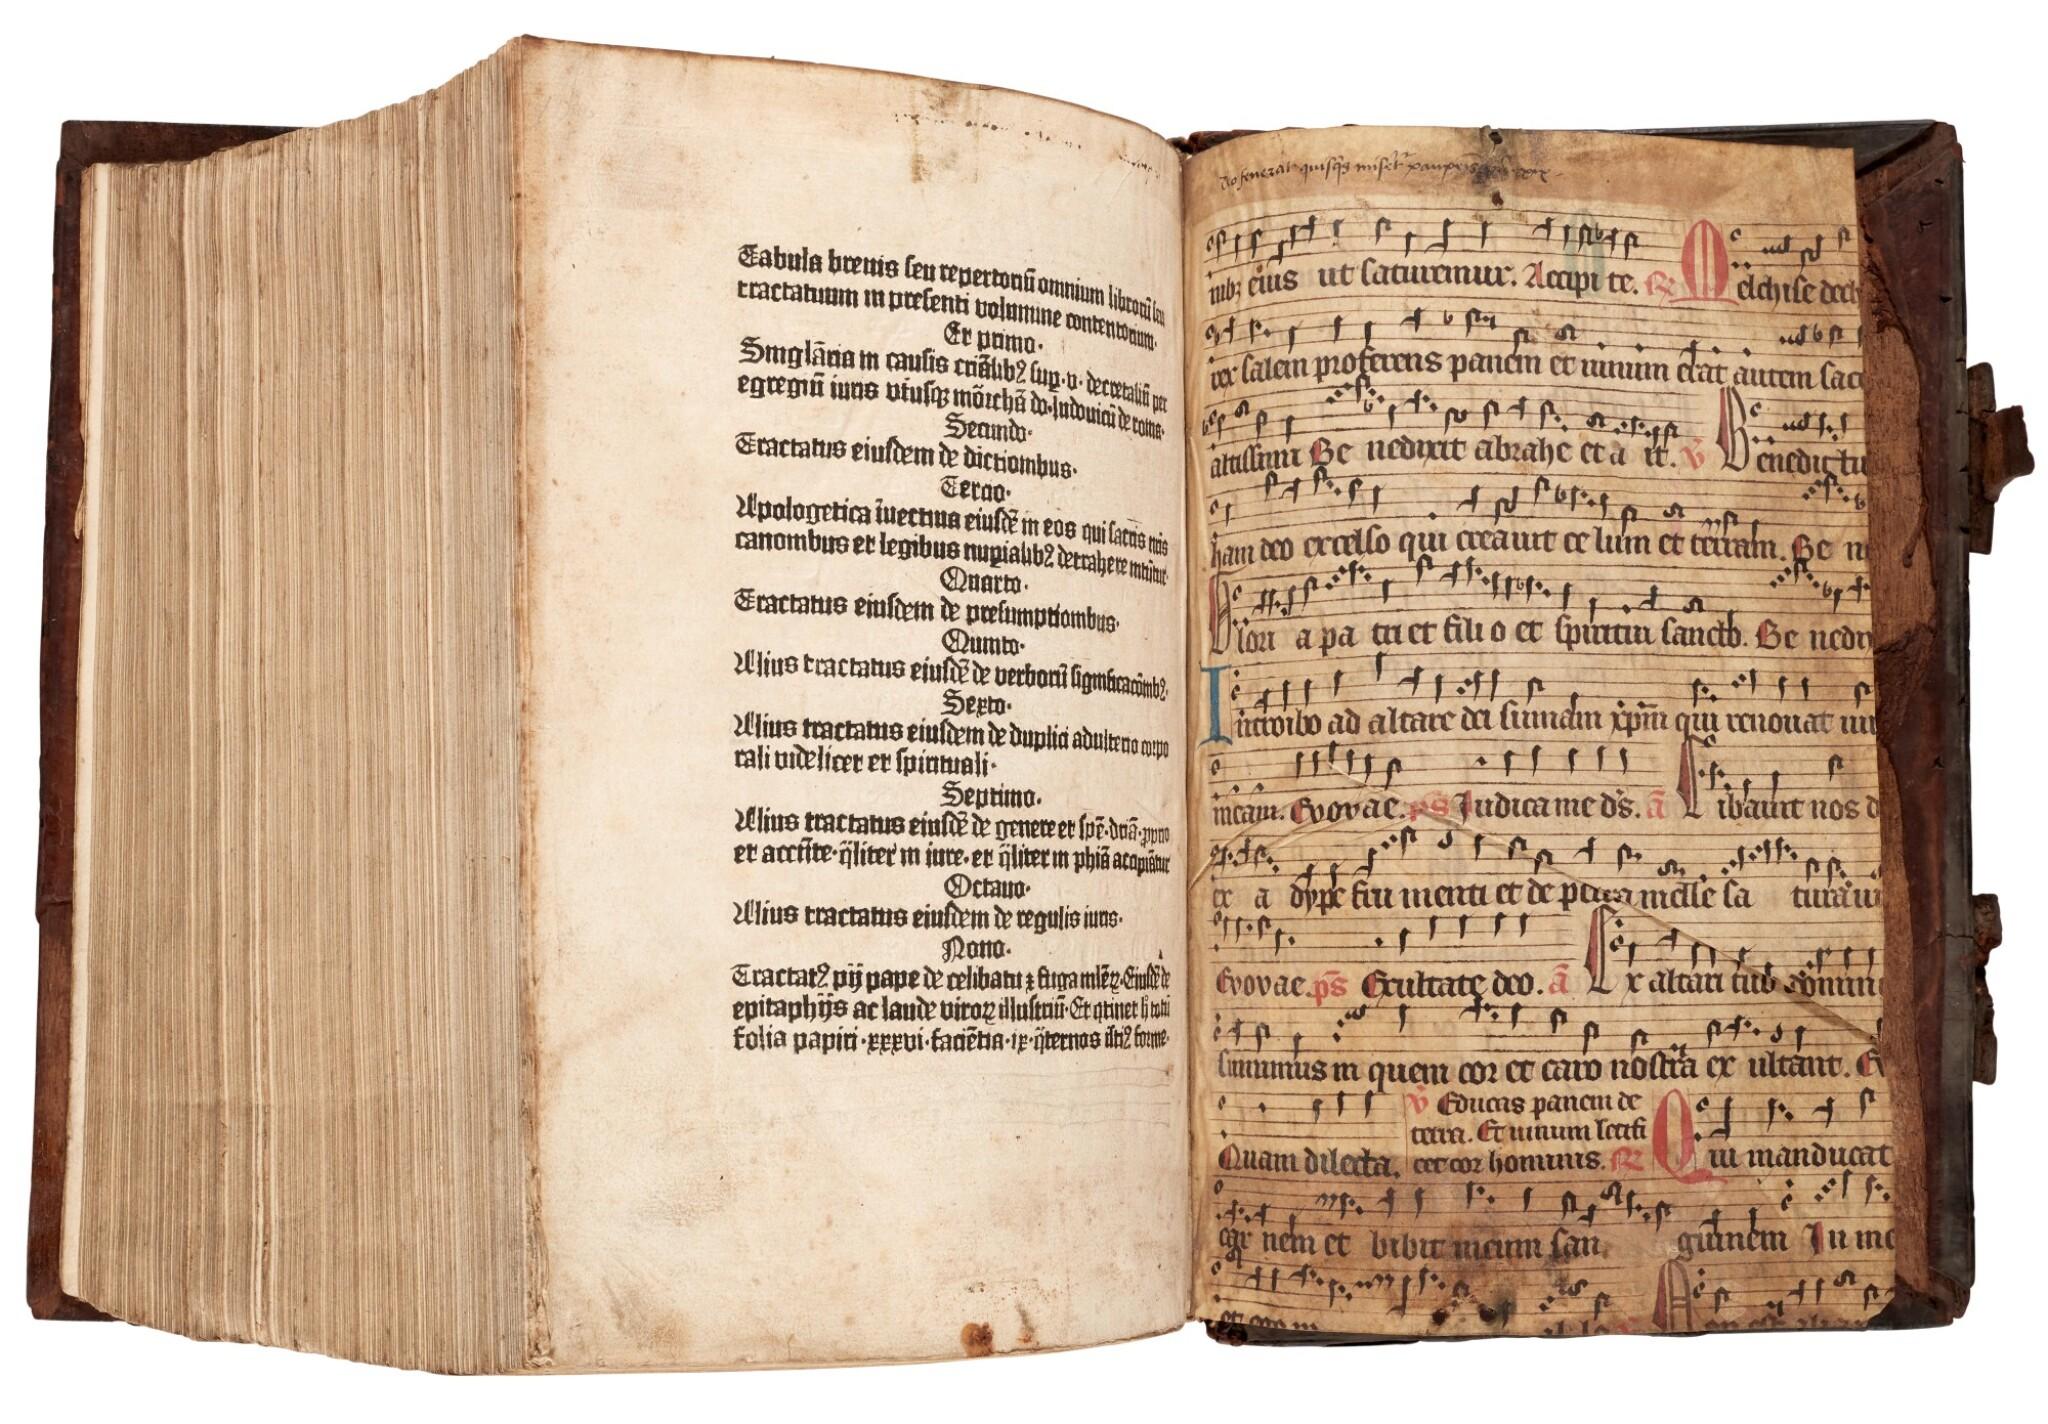 View full screen - View 1 of Lot 110. Dutch Prototypographer, Inventory, single sheet, [Utrecht, 1460s], in binding of Eck, Homiliarius, 1536-1540.